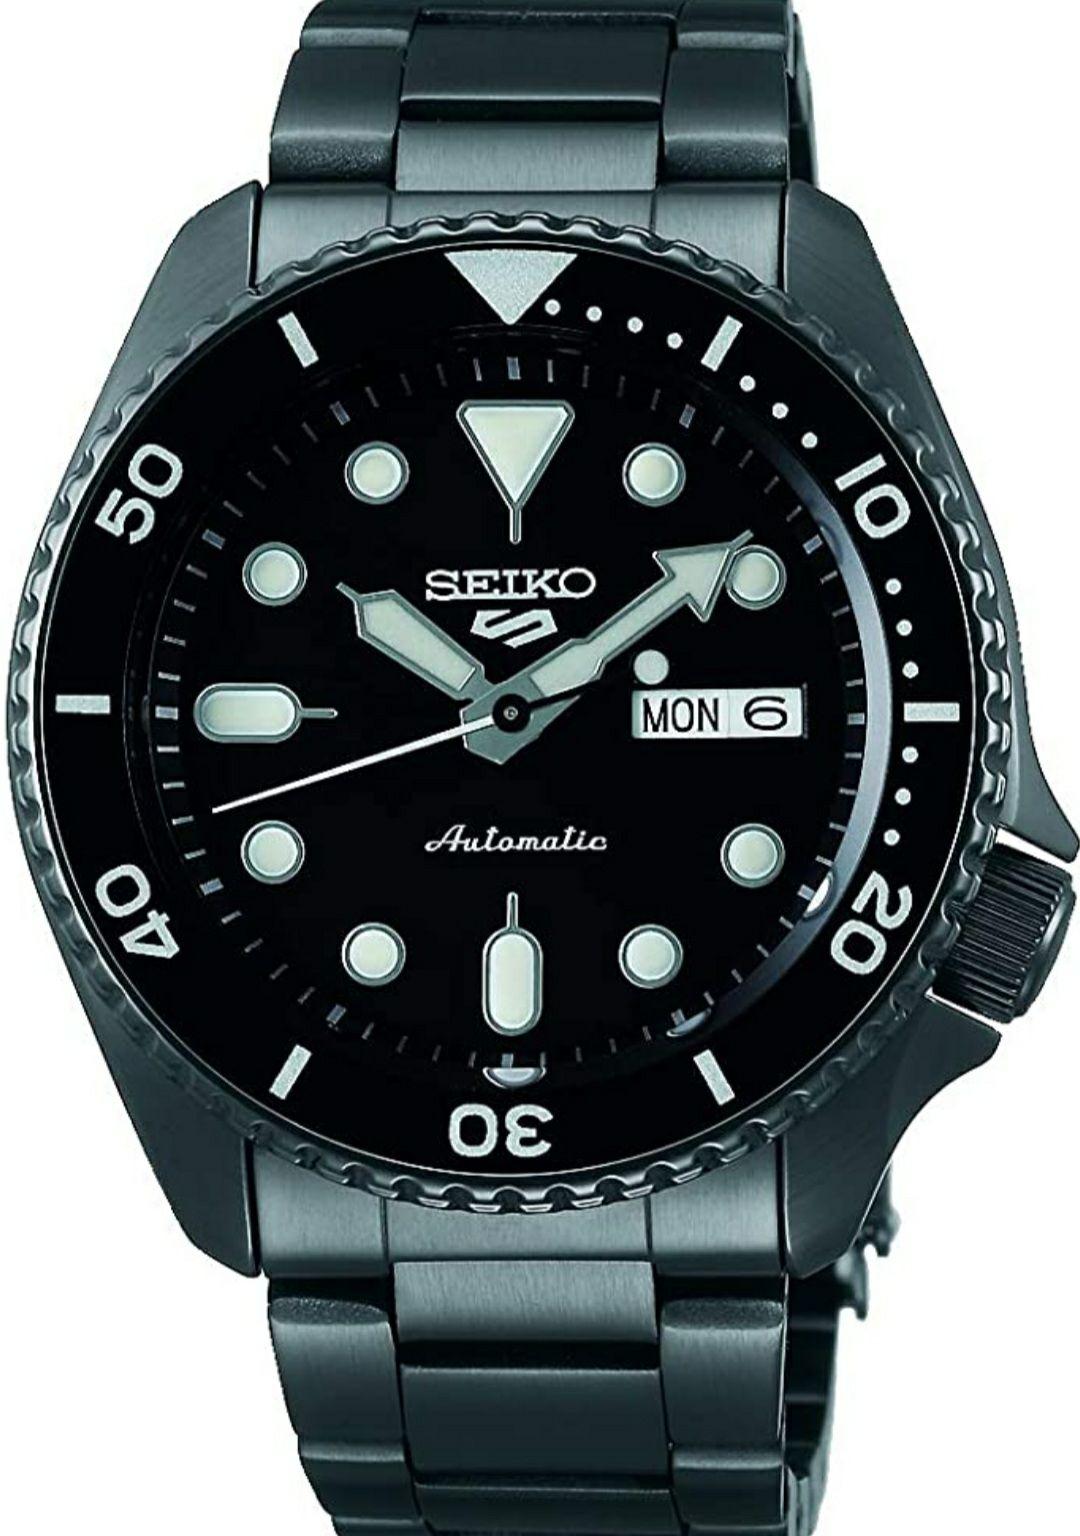 Seiko Reloj Analógico Seiko 5 Sports